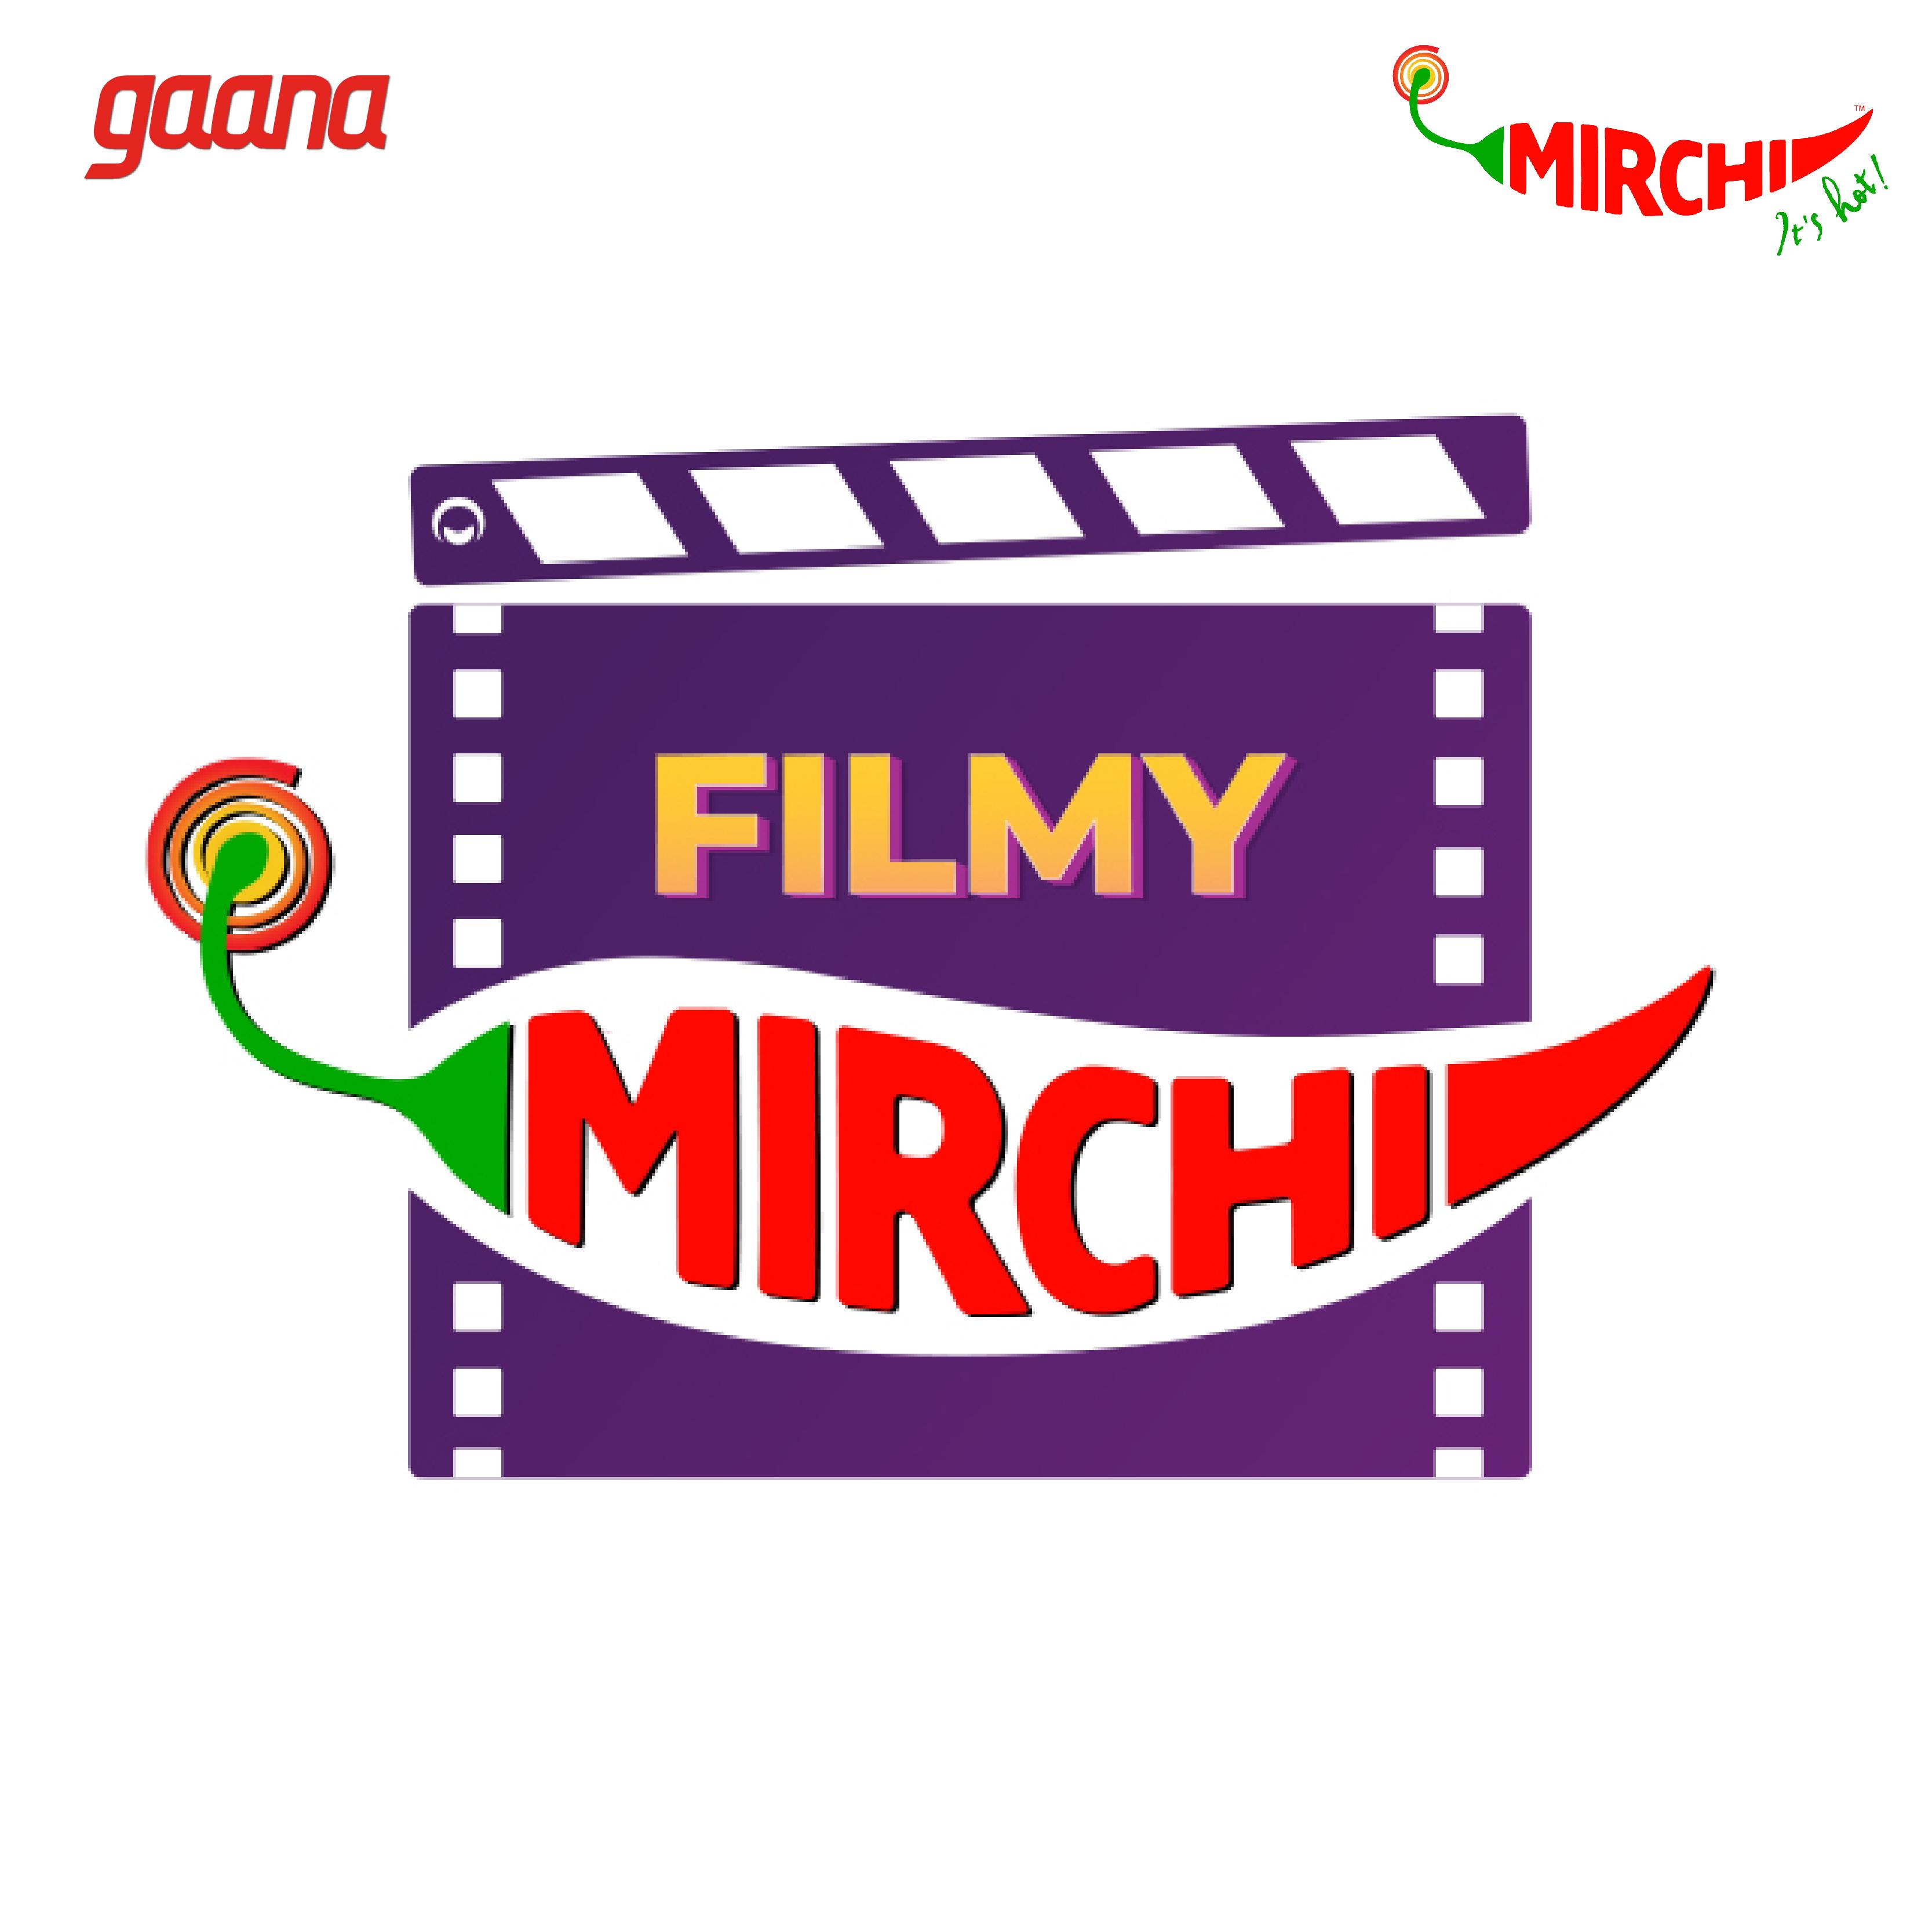 Mirchi dating online Bangladesh siti Web di incontri